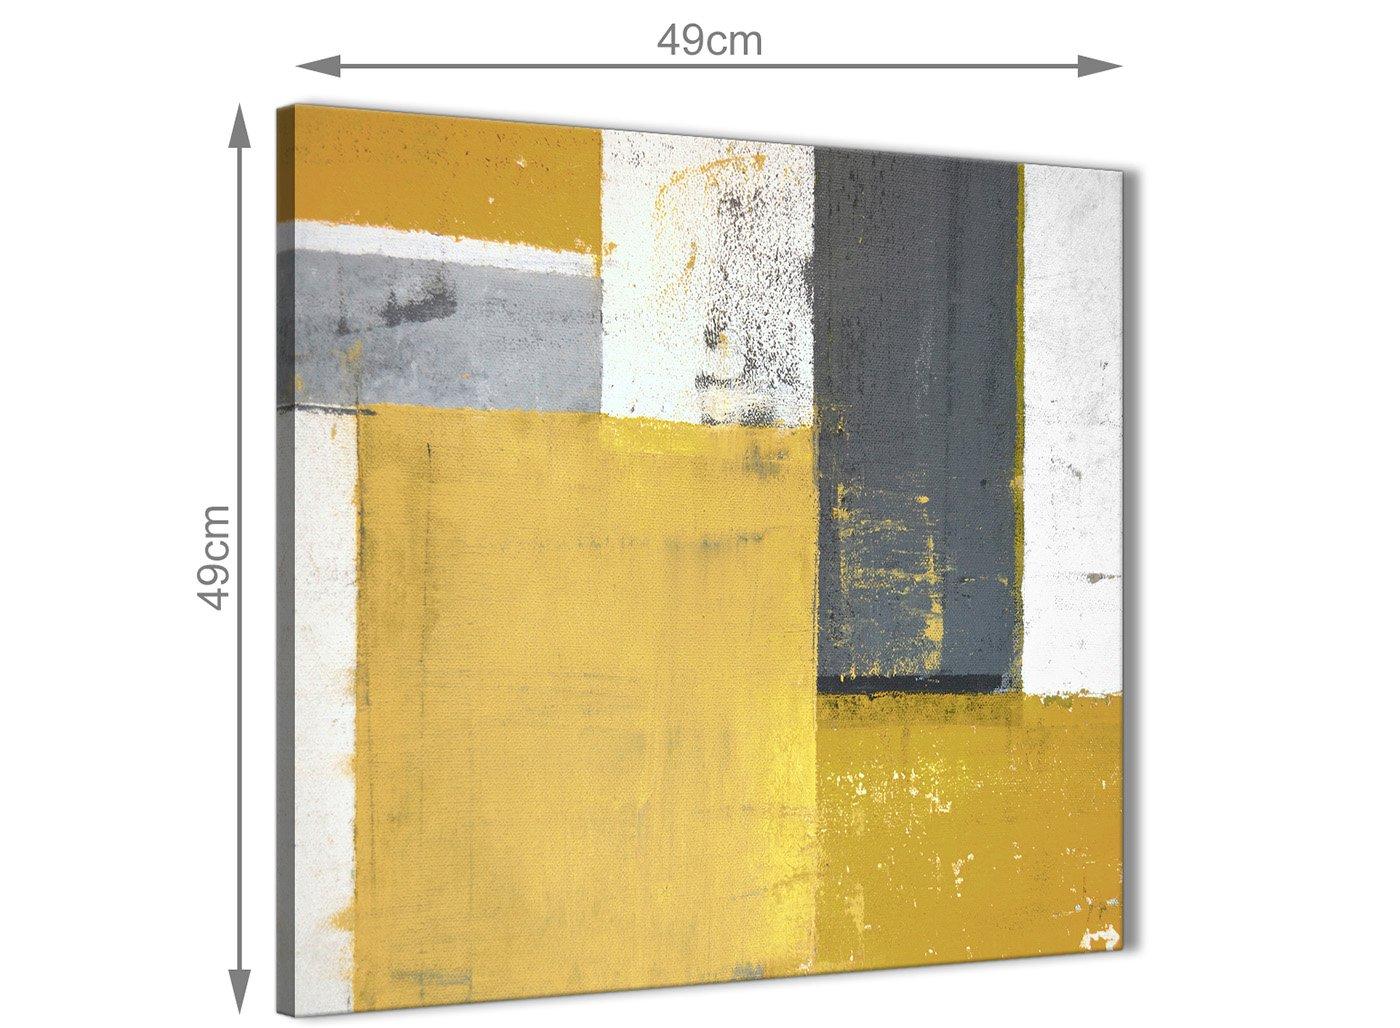 Mobel Wohnen Wandbehange 49cm Mustard Yellow Grey Painting Bathroom Canvas Wall Art Abstract 1s419s